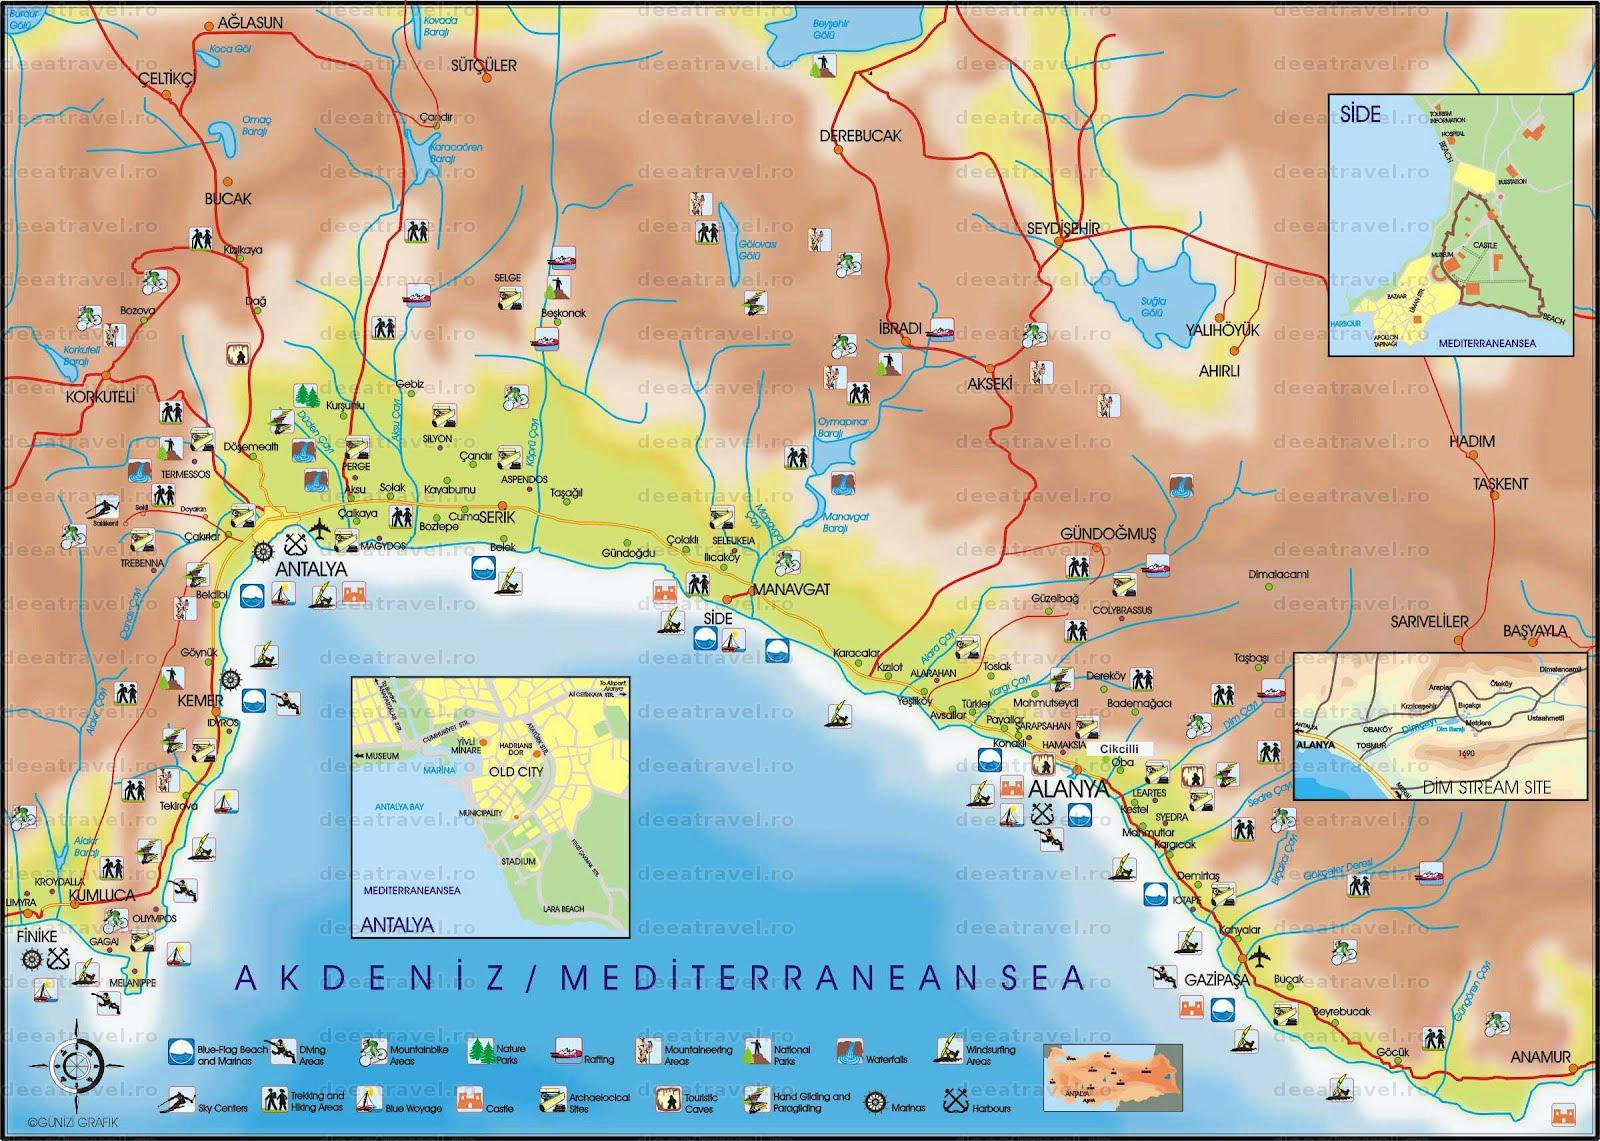 turcia litoral harta Turcia   Litoral 2019, Antalya 2016, Agentia De Turism Deea Travel  turcia litoral harta